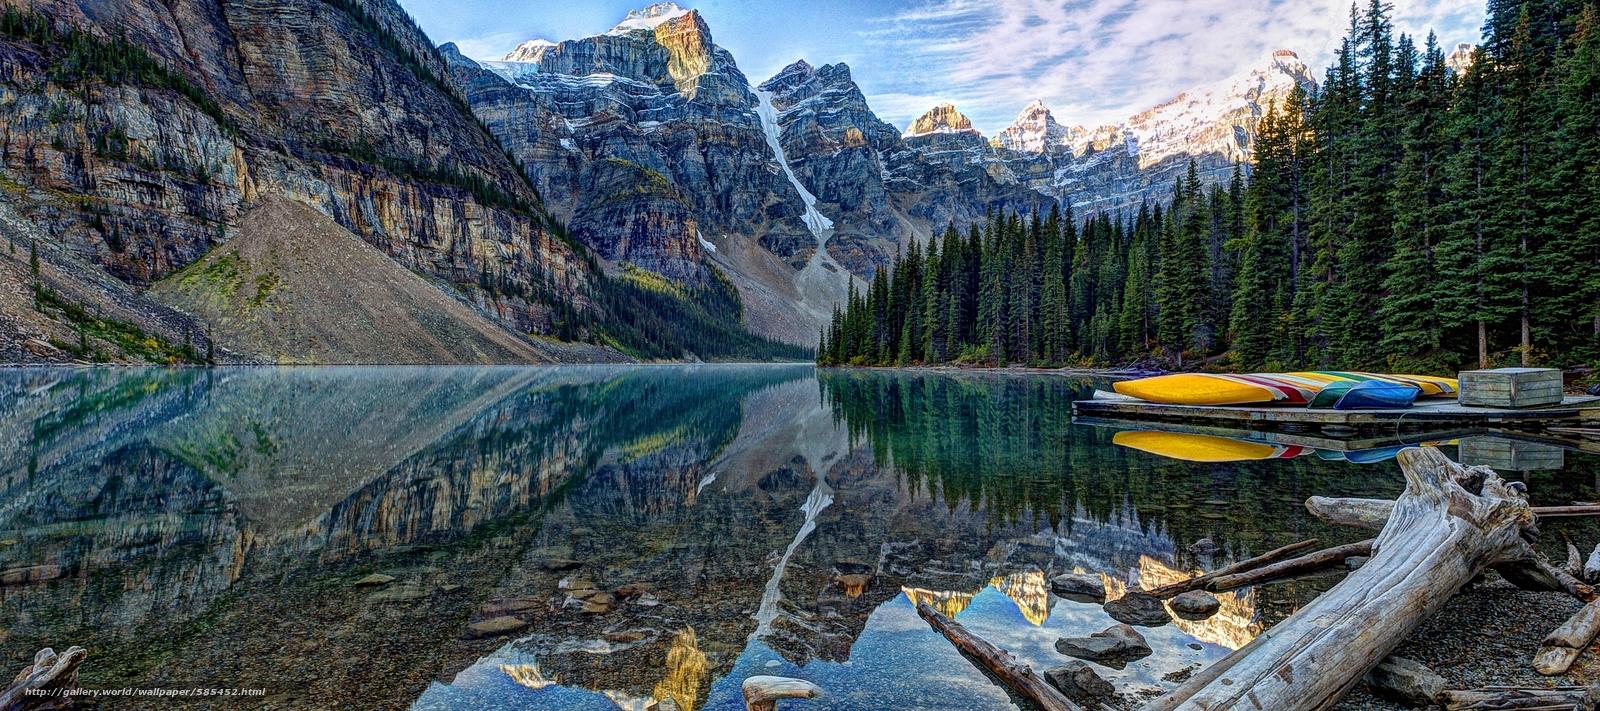 Download wallpaper Moraine Lake Banff National Park lake Mountains 1600x711